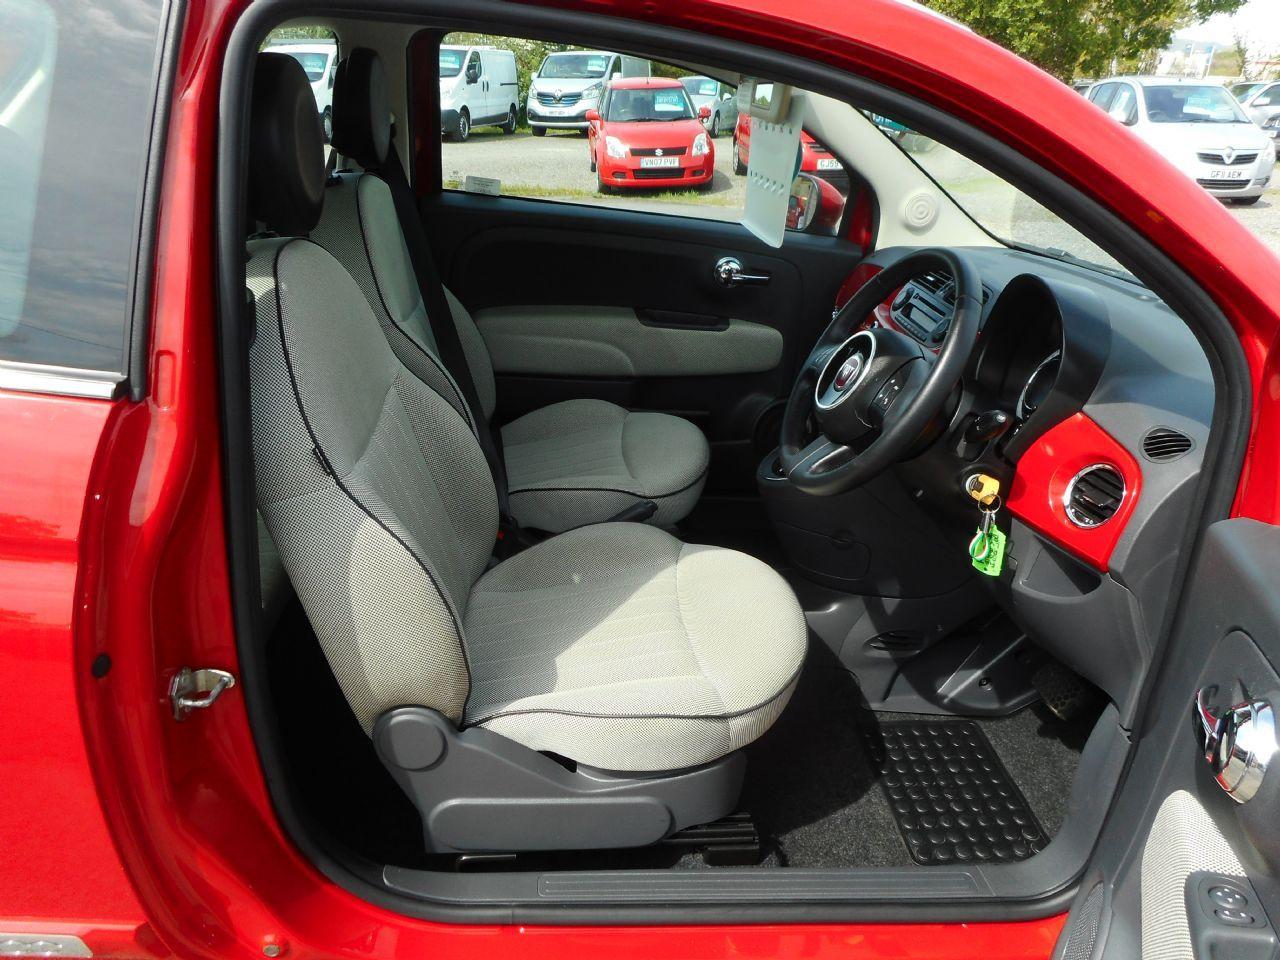 FIAT 500 1.2i Lounge S/S AUTO (2011) - Picture 6